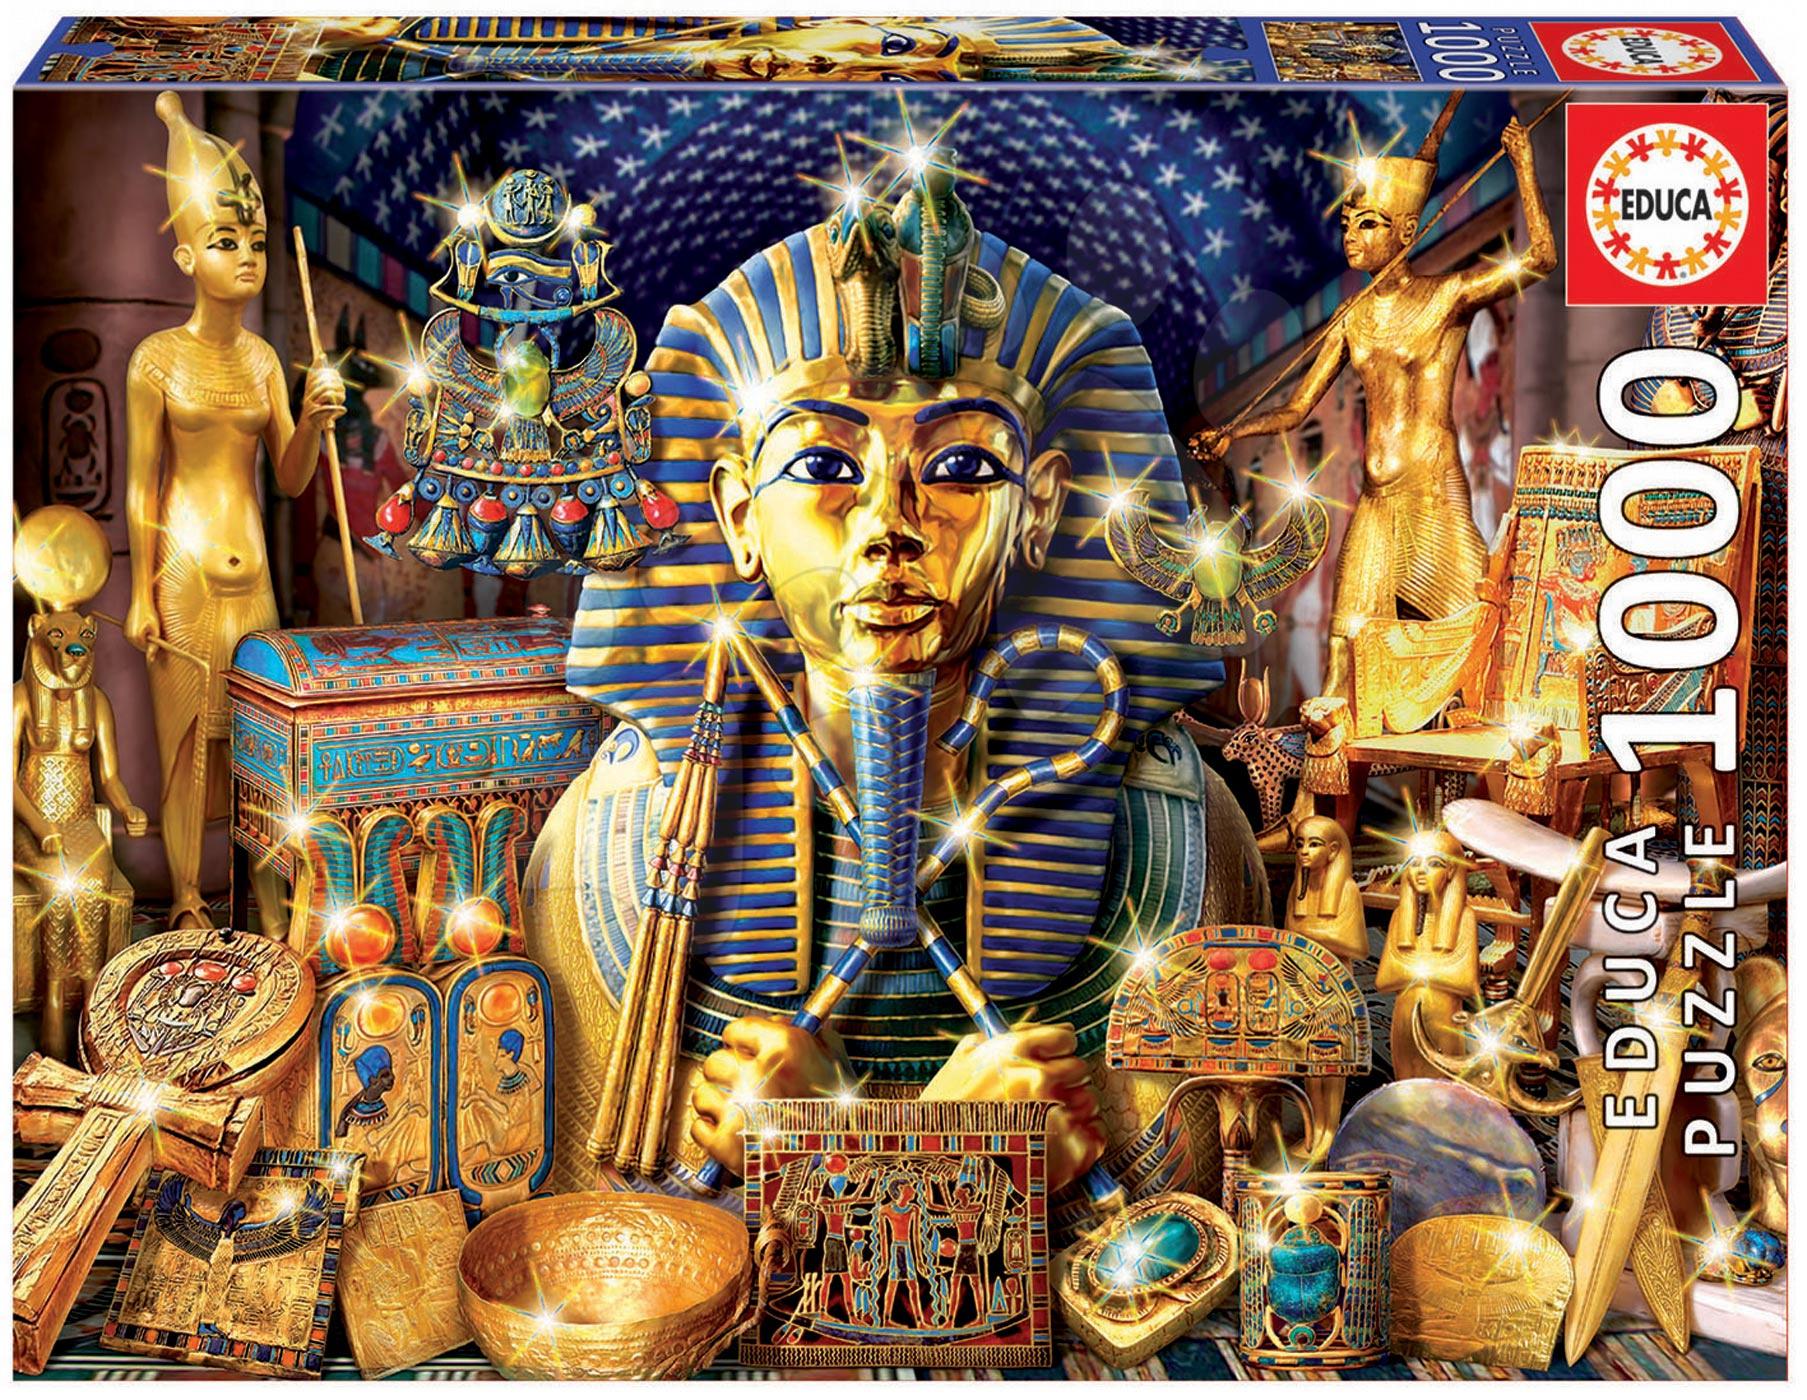 Puzzle 1000 dielne - Puzzle Genuine Treasures of Egypt Educa 1000 dielov od 12 rokov